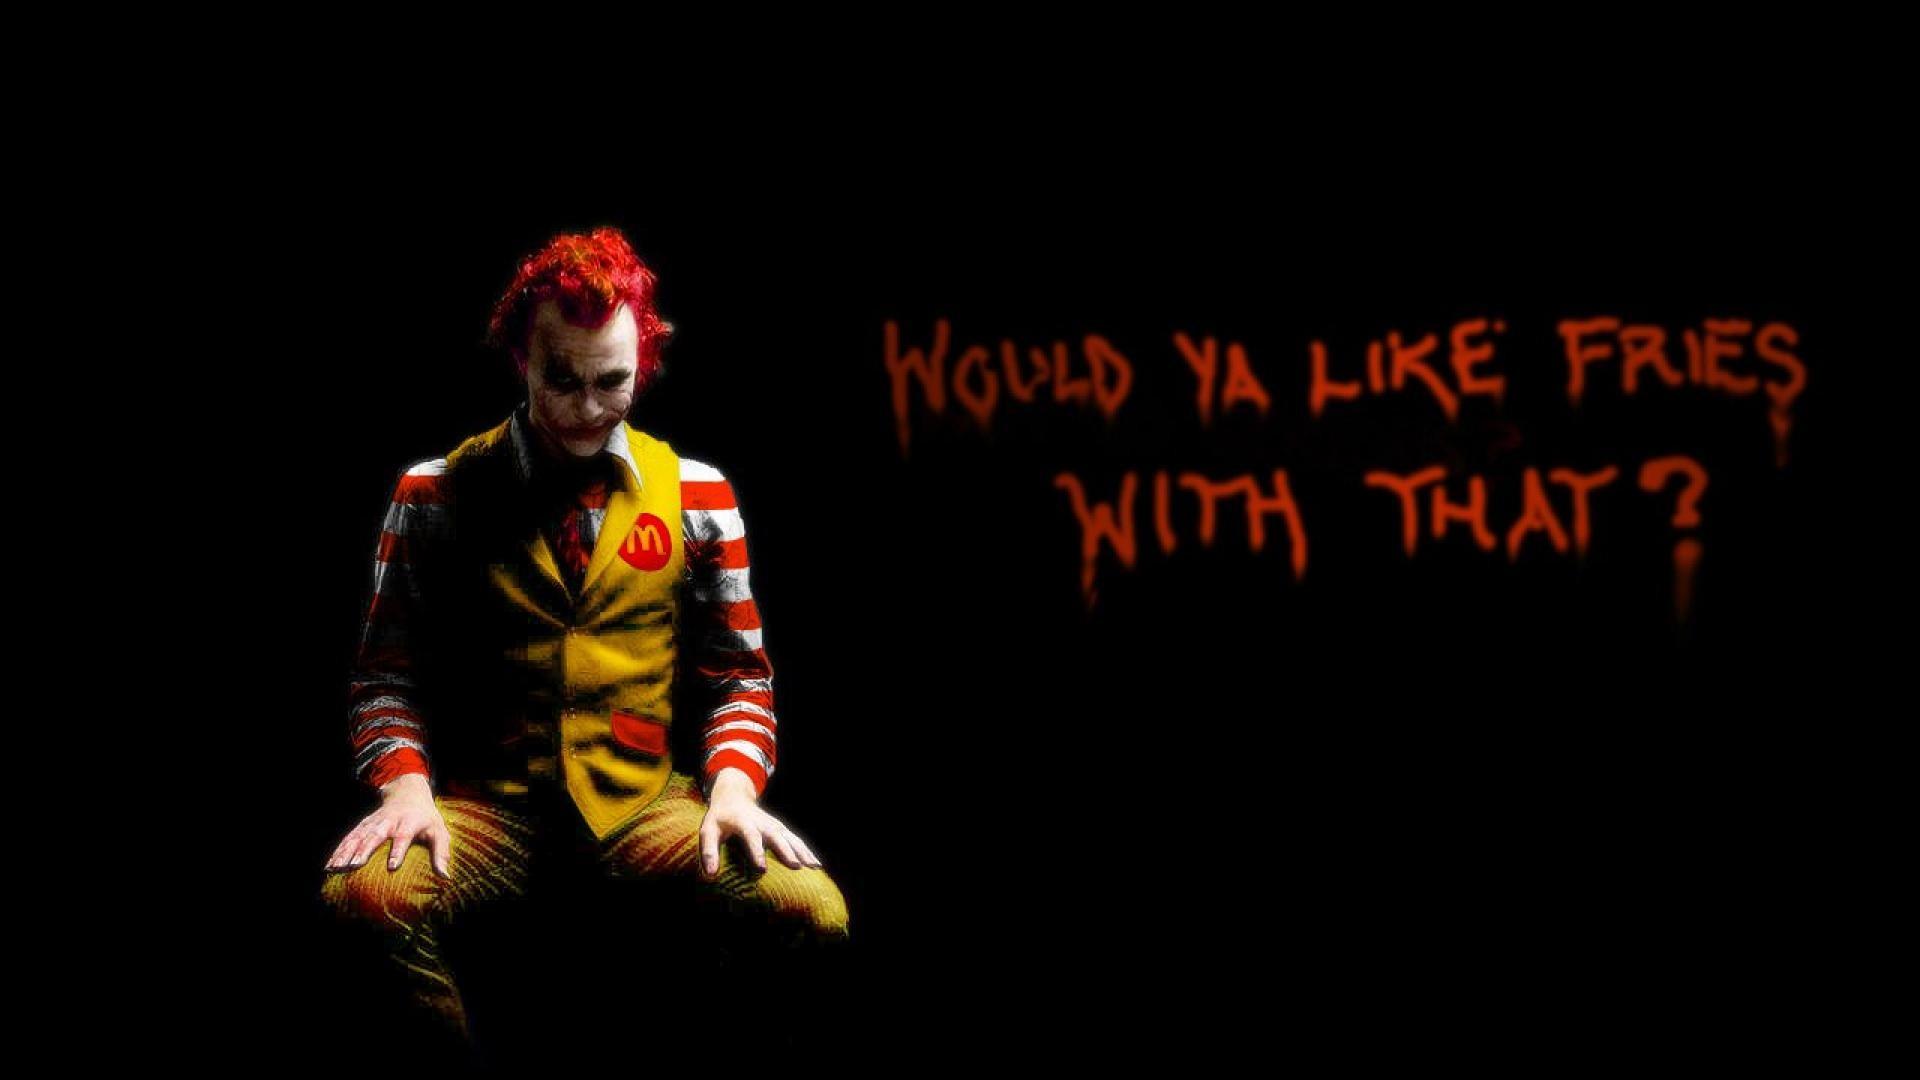 Joker Wallpaper HD Resolution